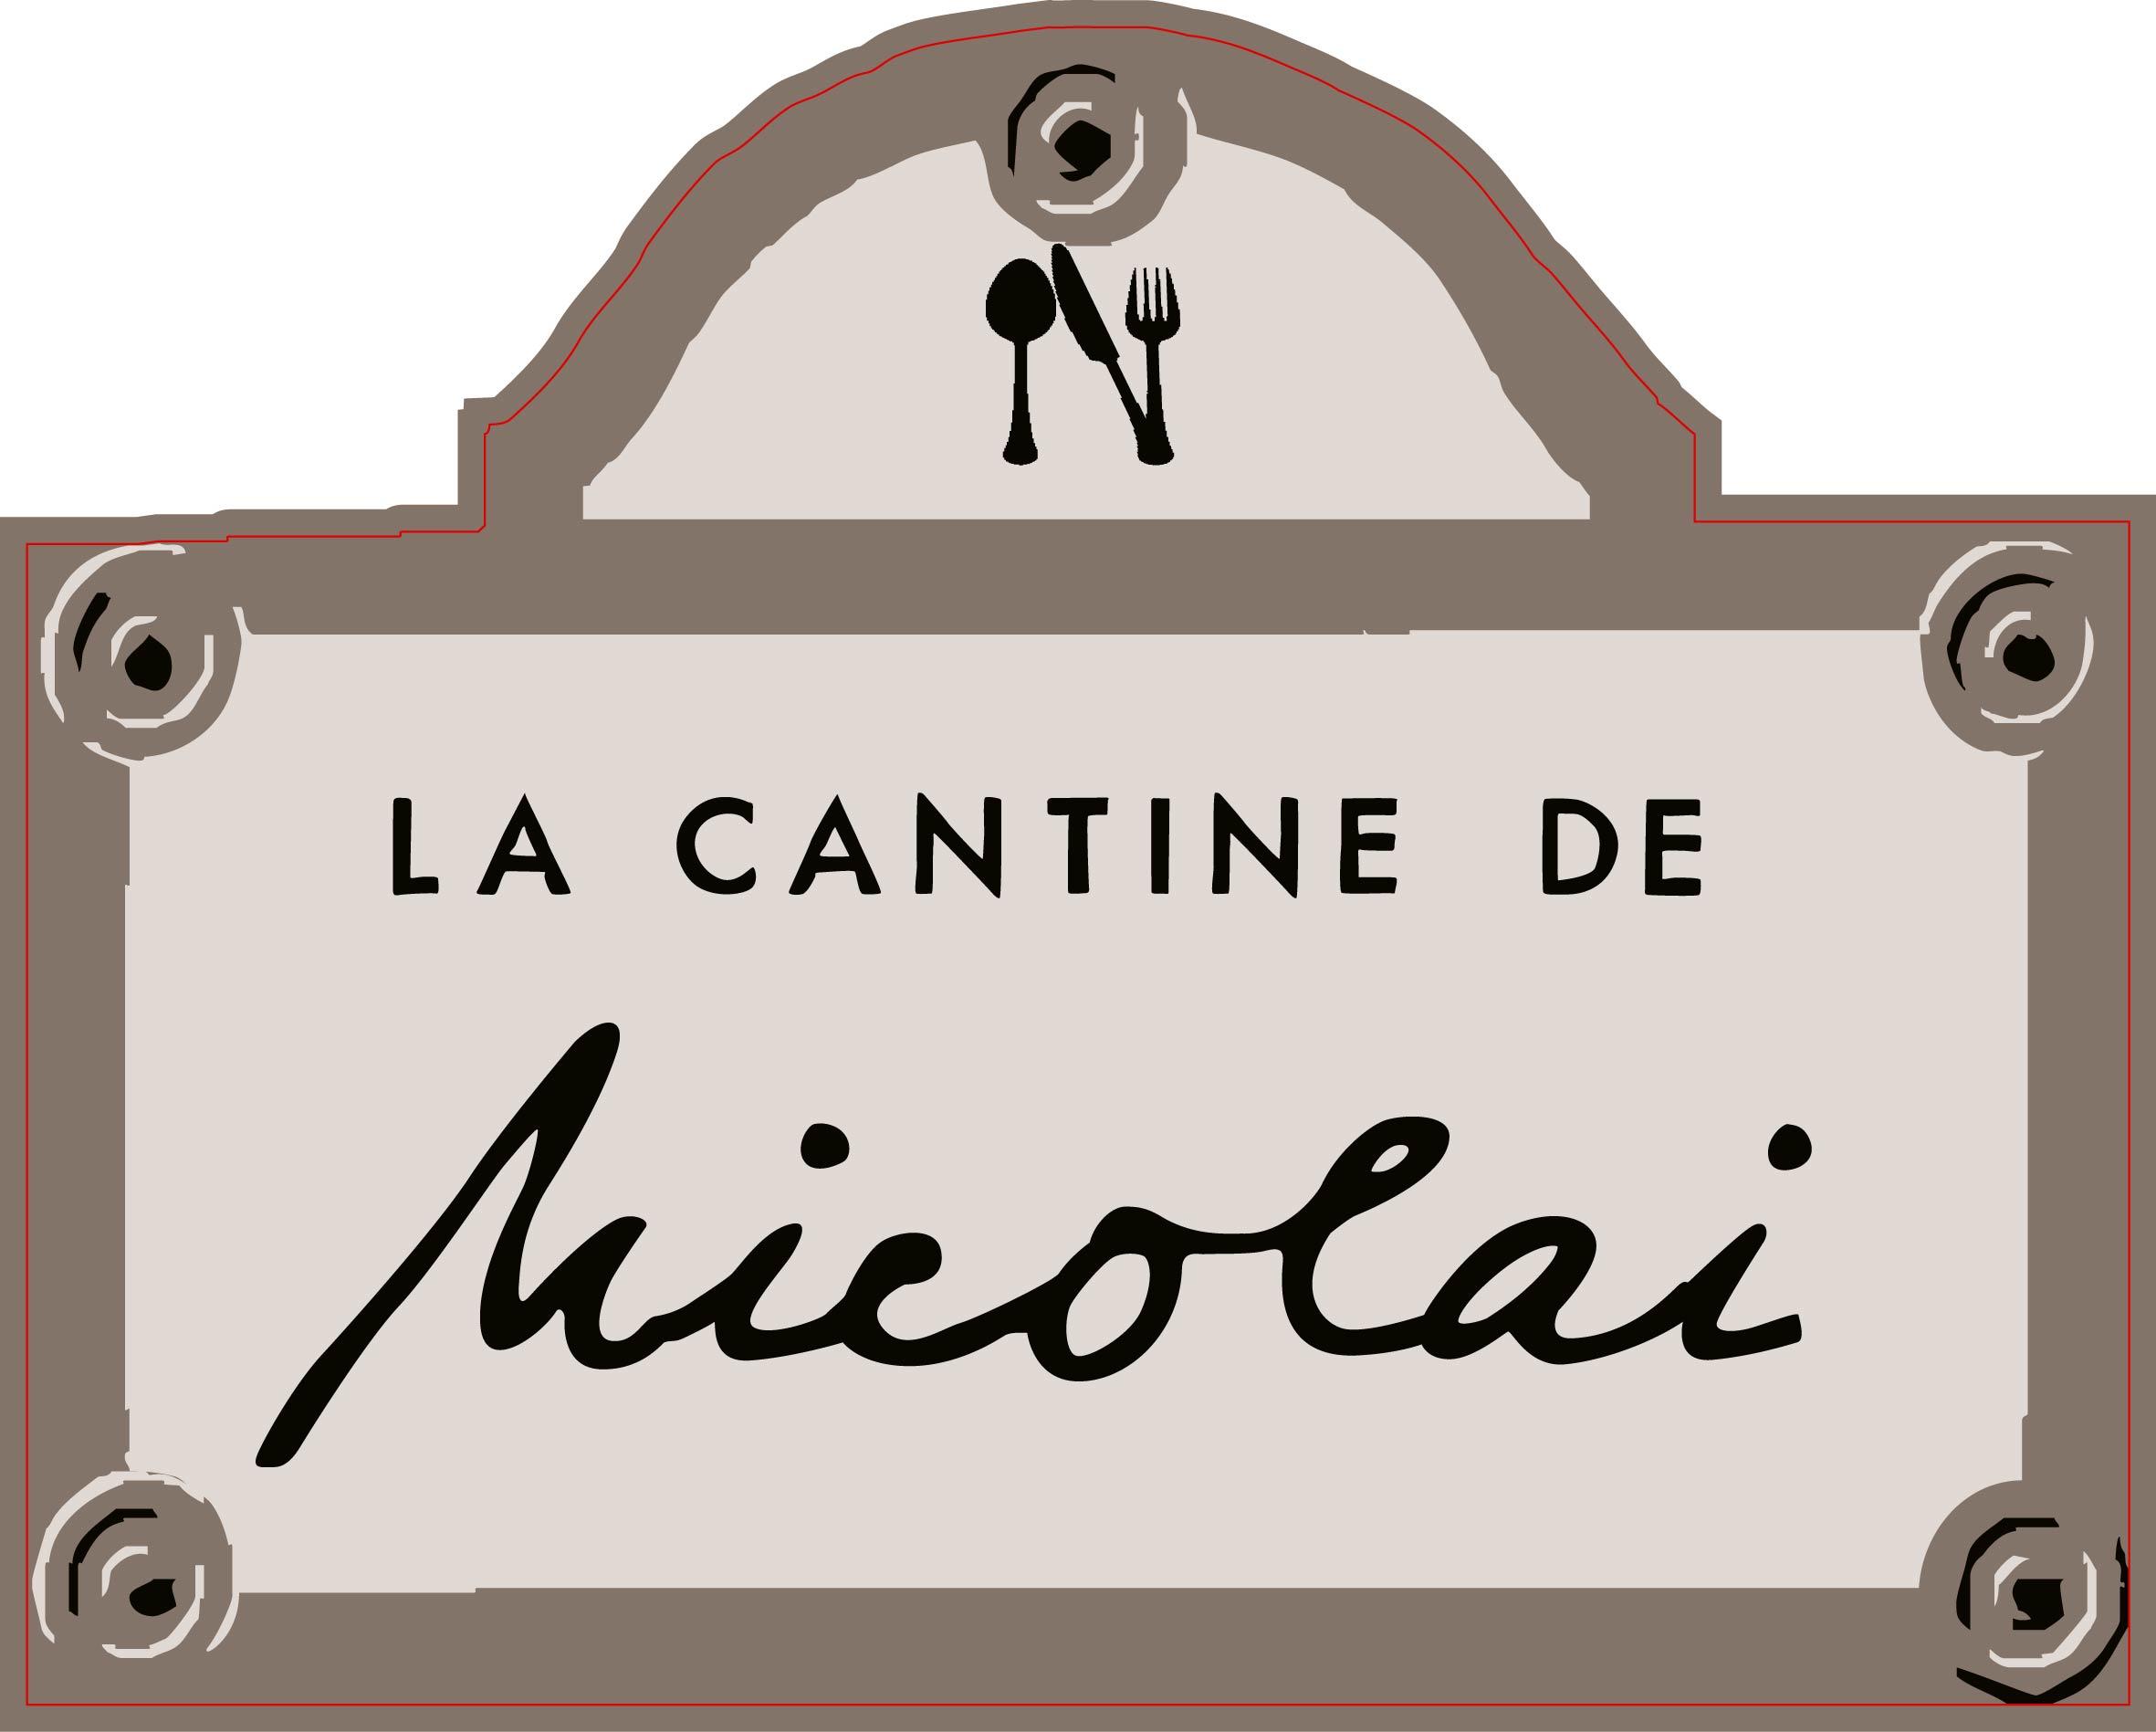 logo-la-cantine-de-nicolai